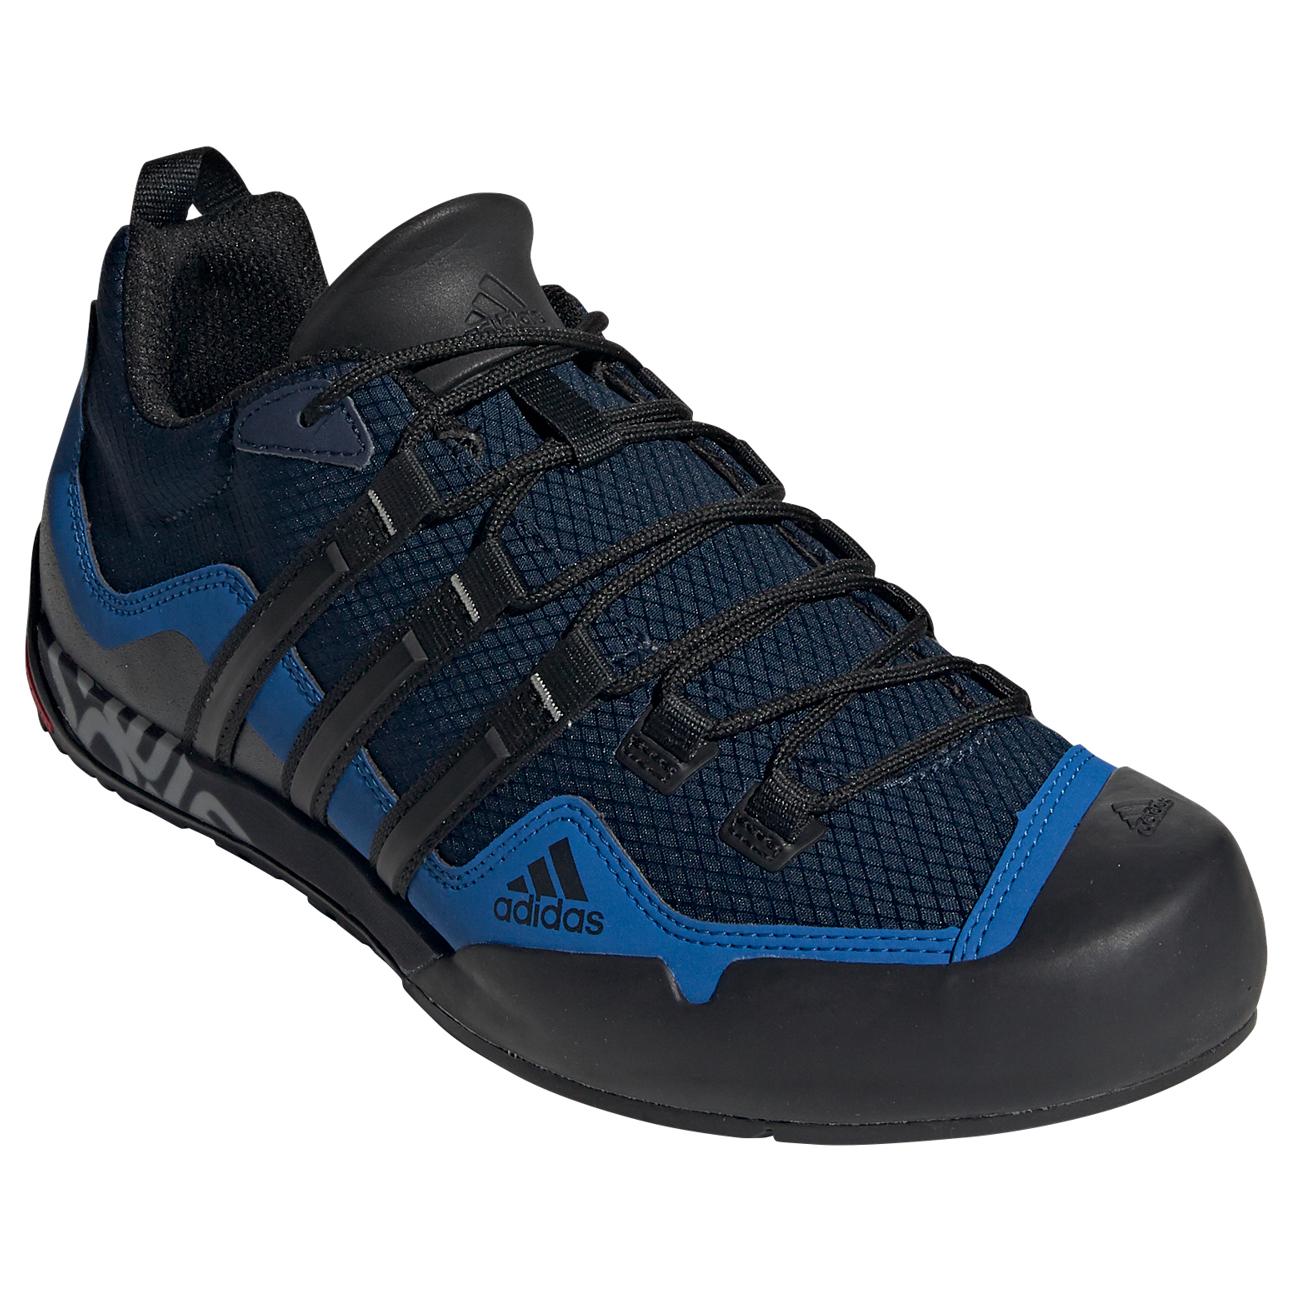 adidas Terrex Swift Solo Approachschoenen Black Carbon Black | 6 (UK)